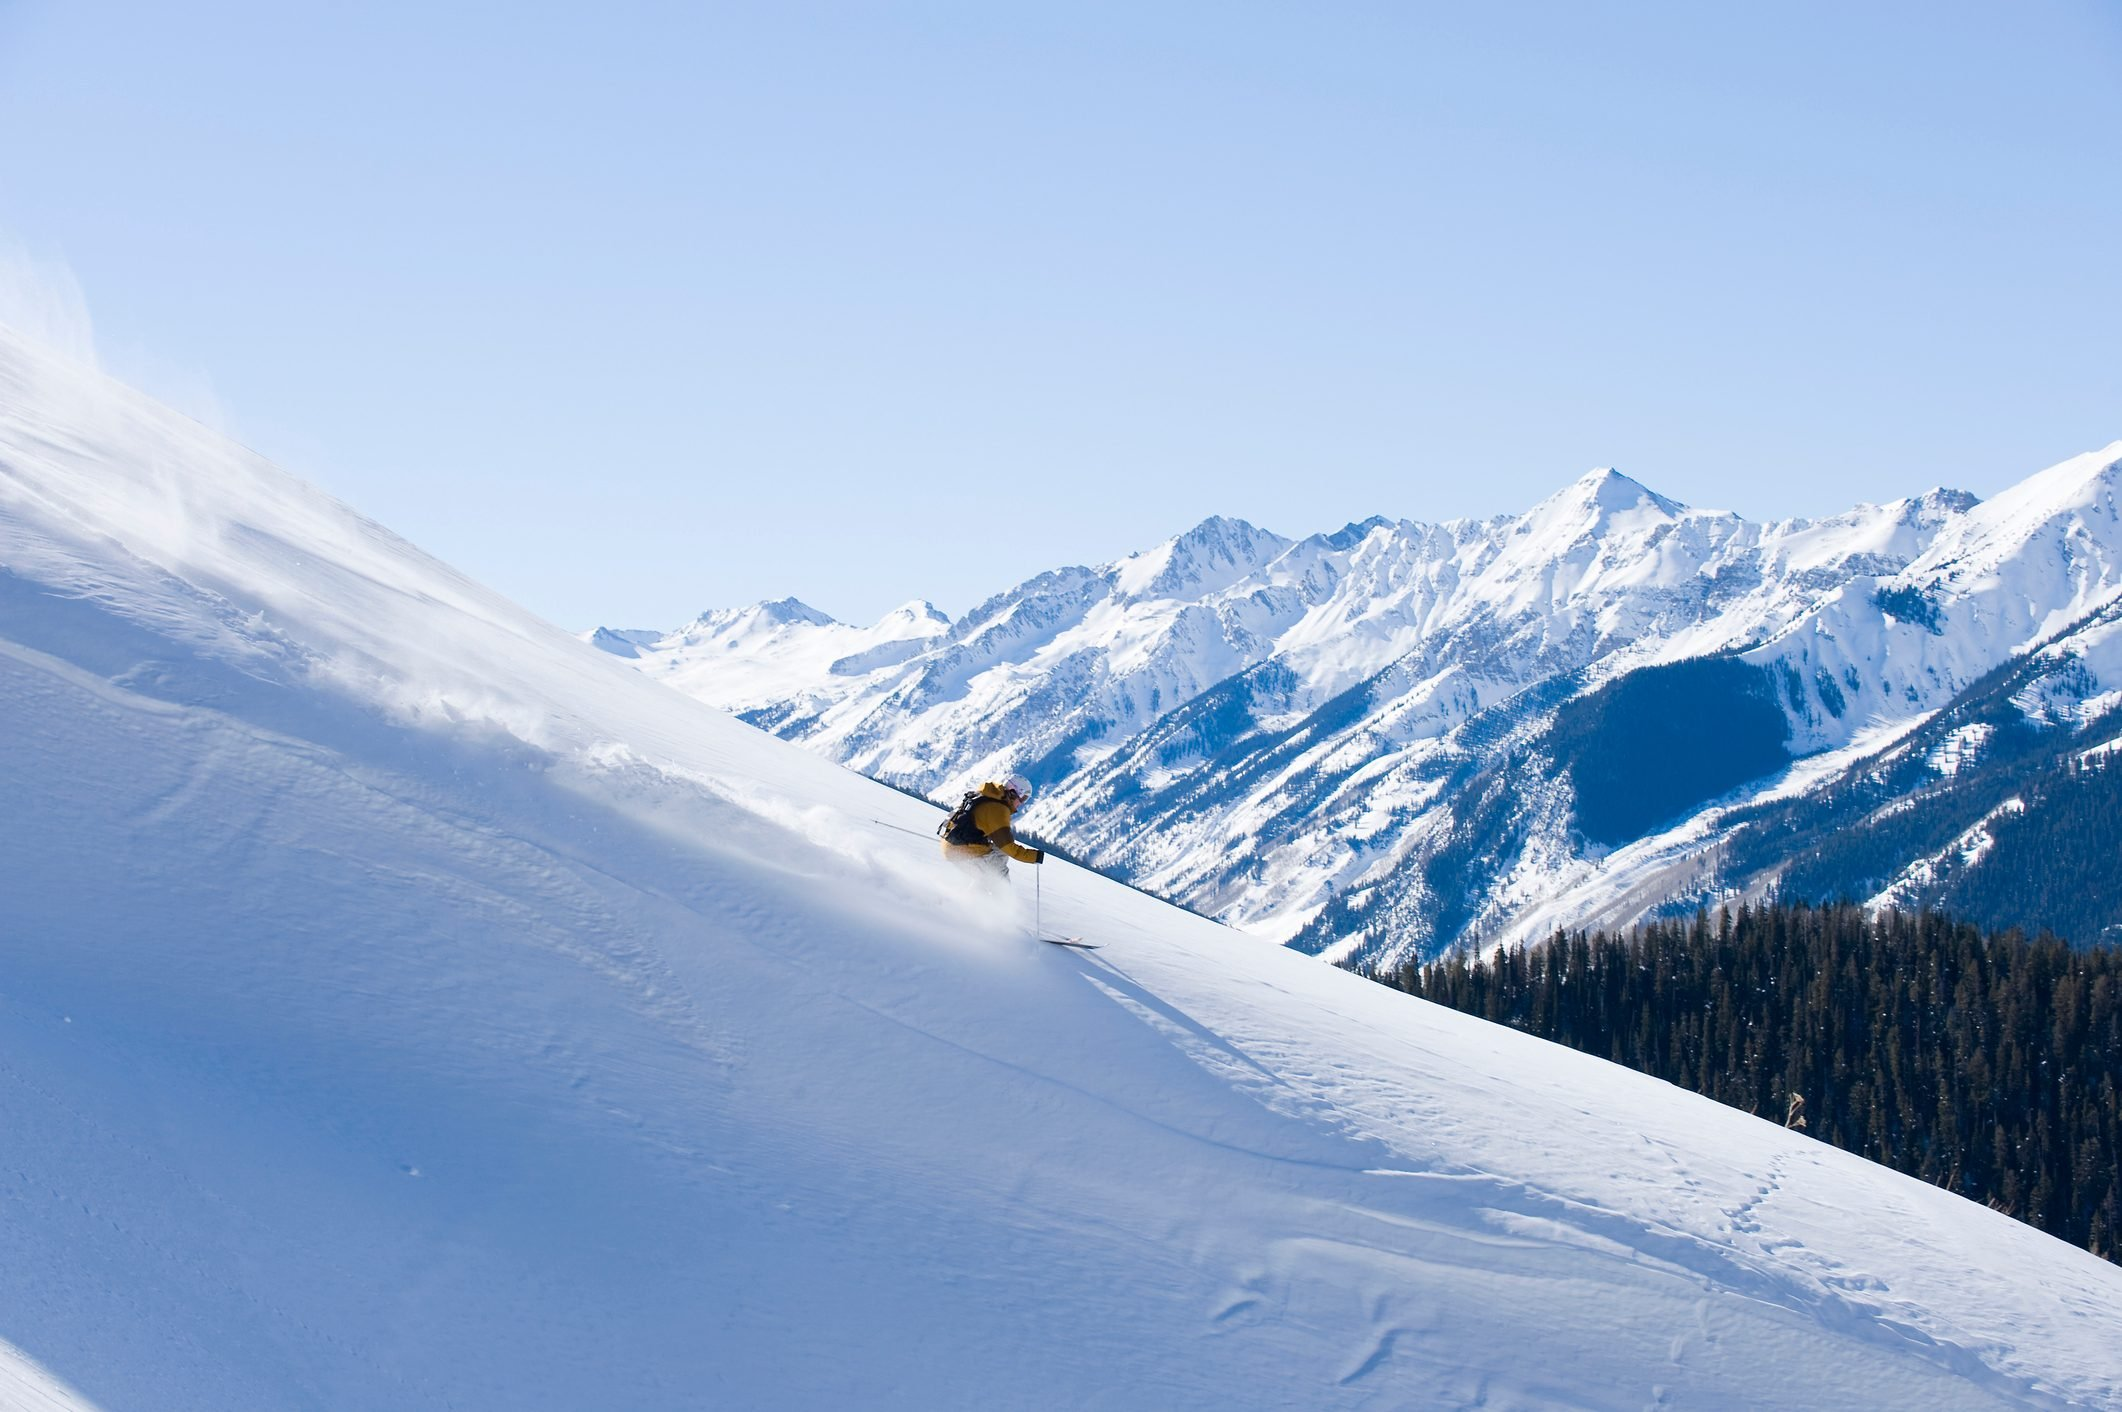 Man skiing in Aspen, Colorado.